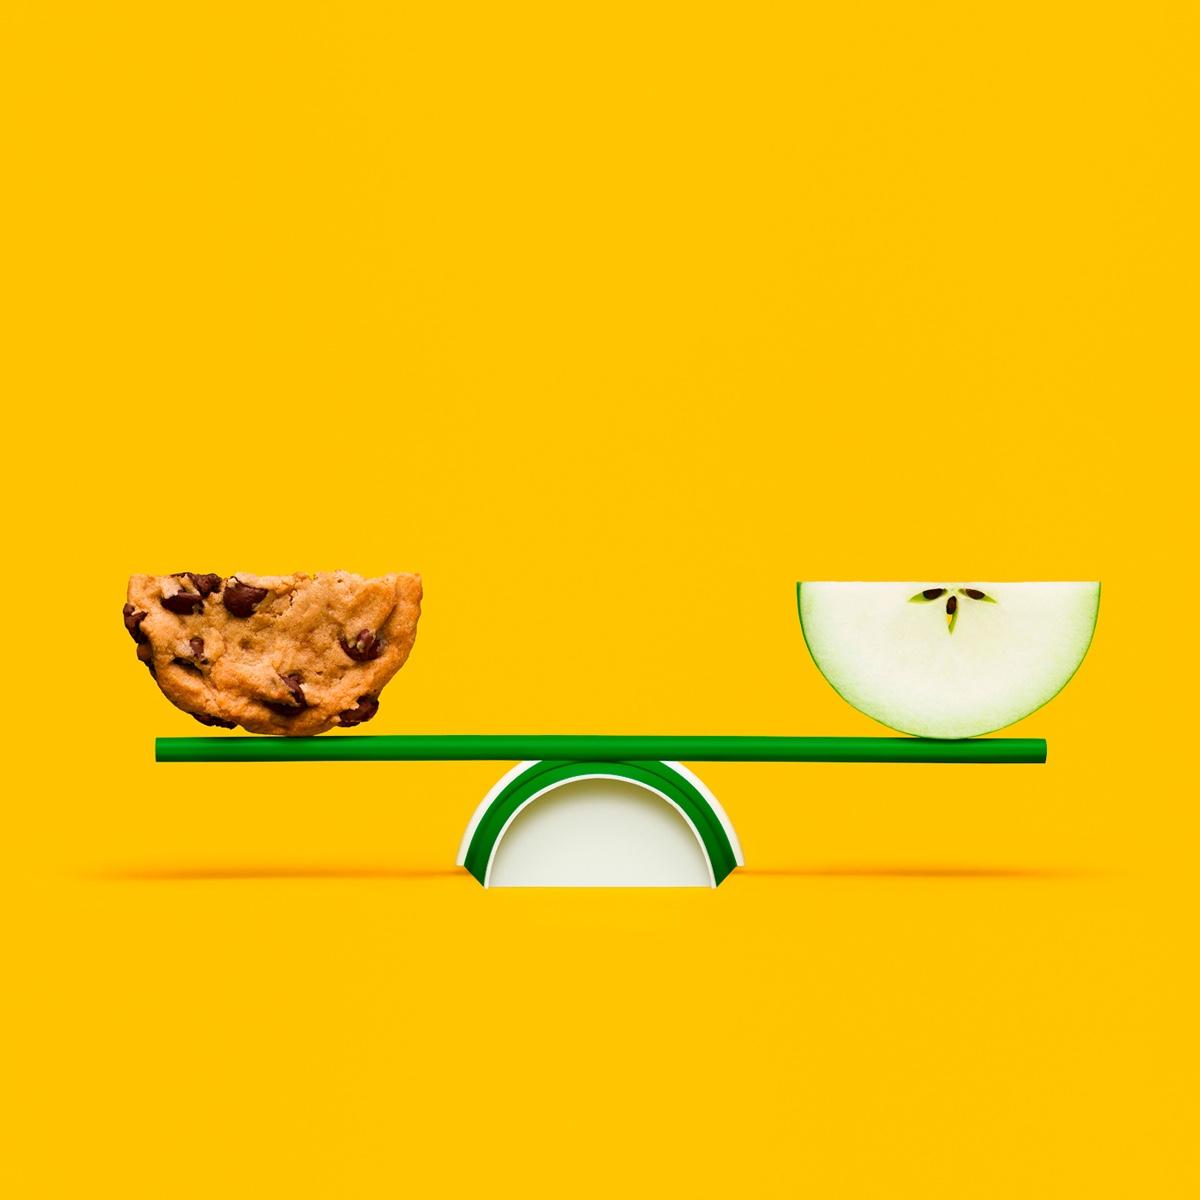 Subway赛百味食品海报